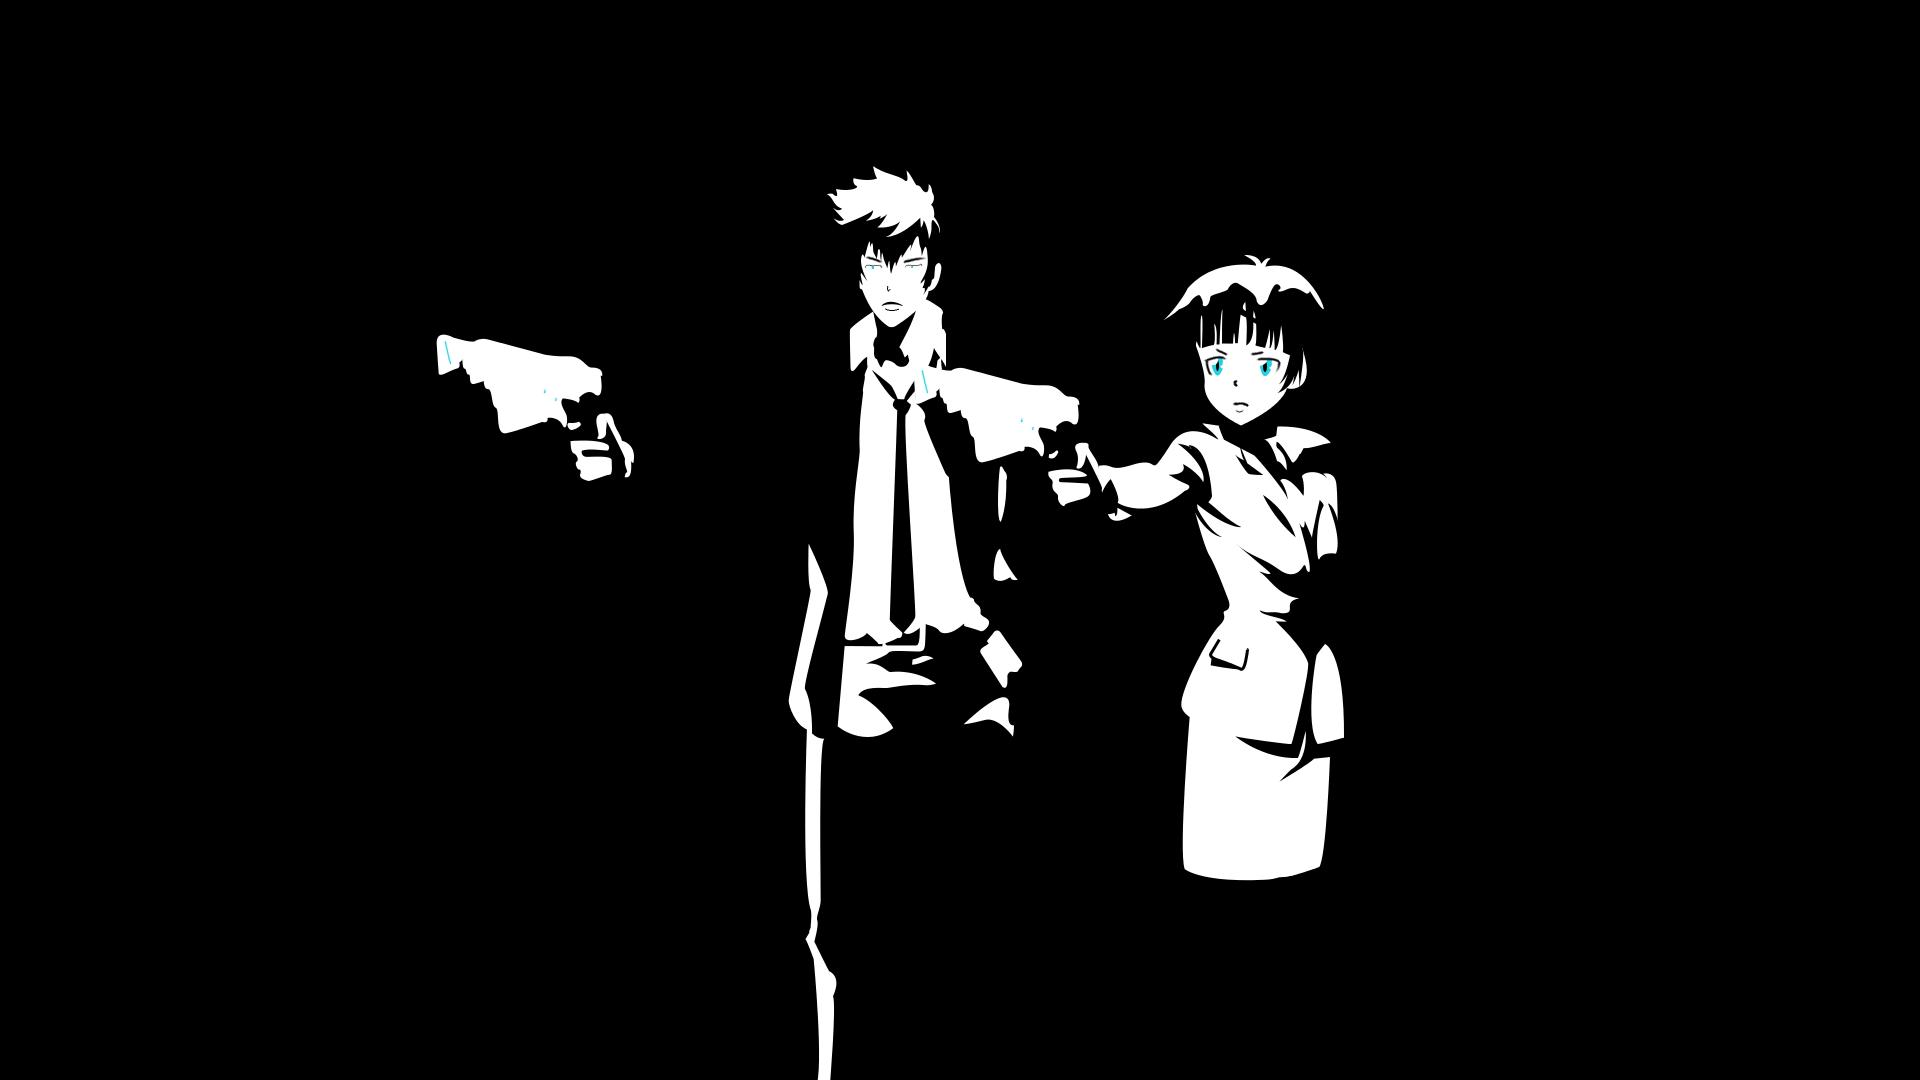 50 lock screen black and white wallpaper iphone. Black and White Anime Aesthetic Wallpapers - Top Free ...